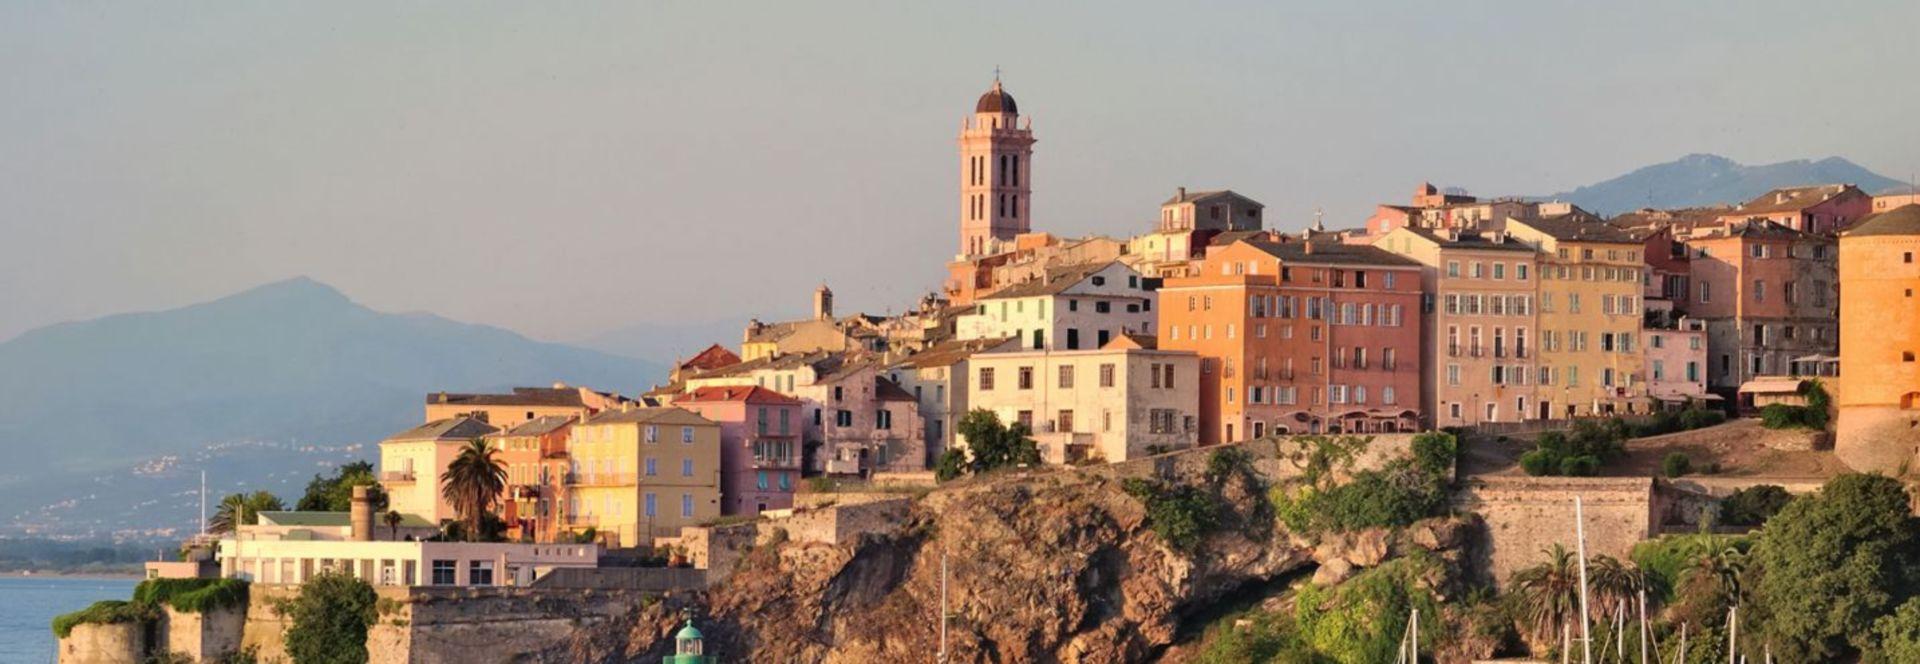 Best Western Bastia Et Ajaccio Htels Et Rsidence